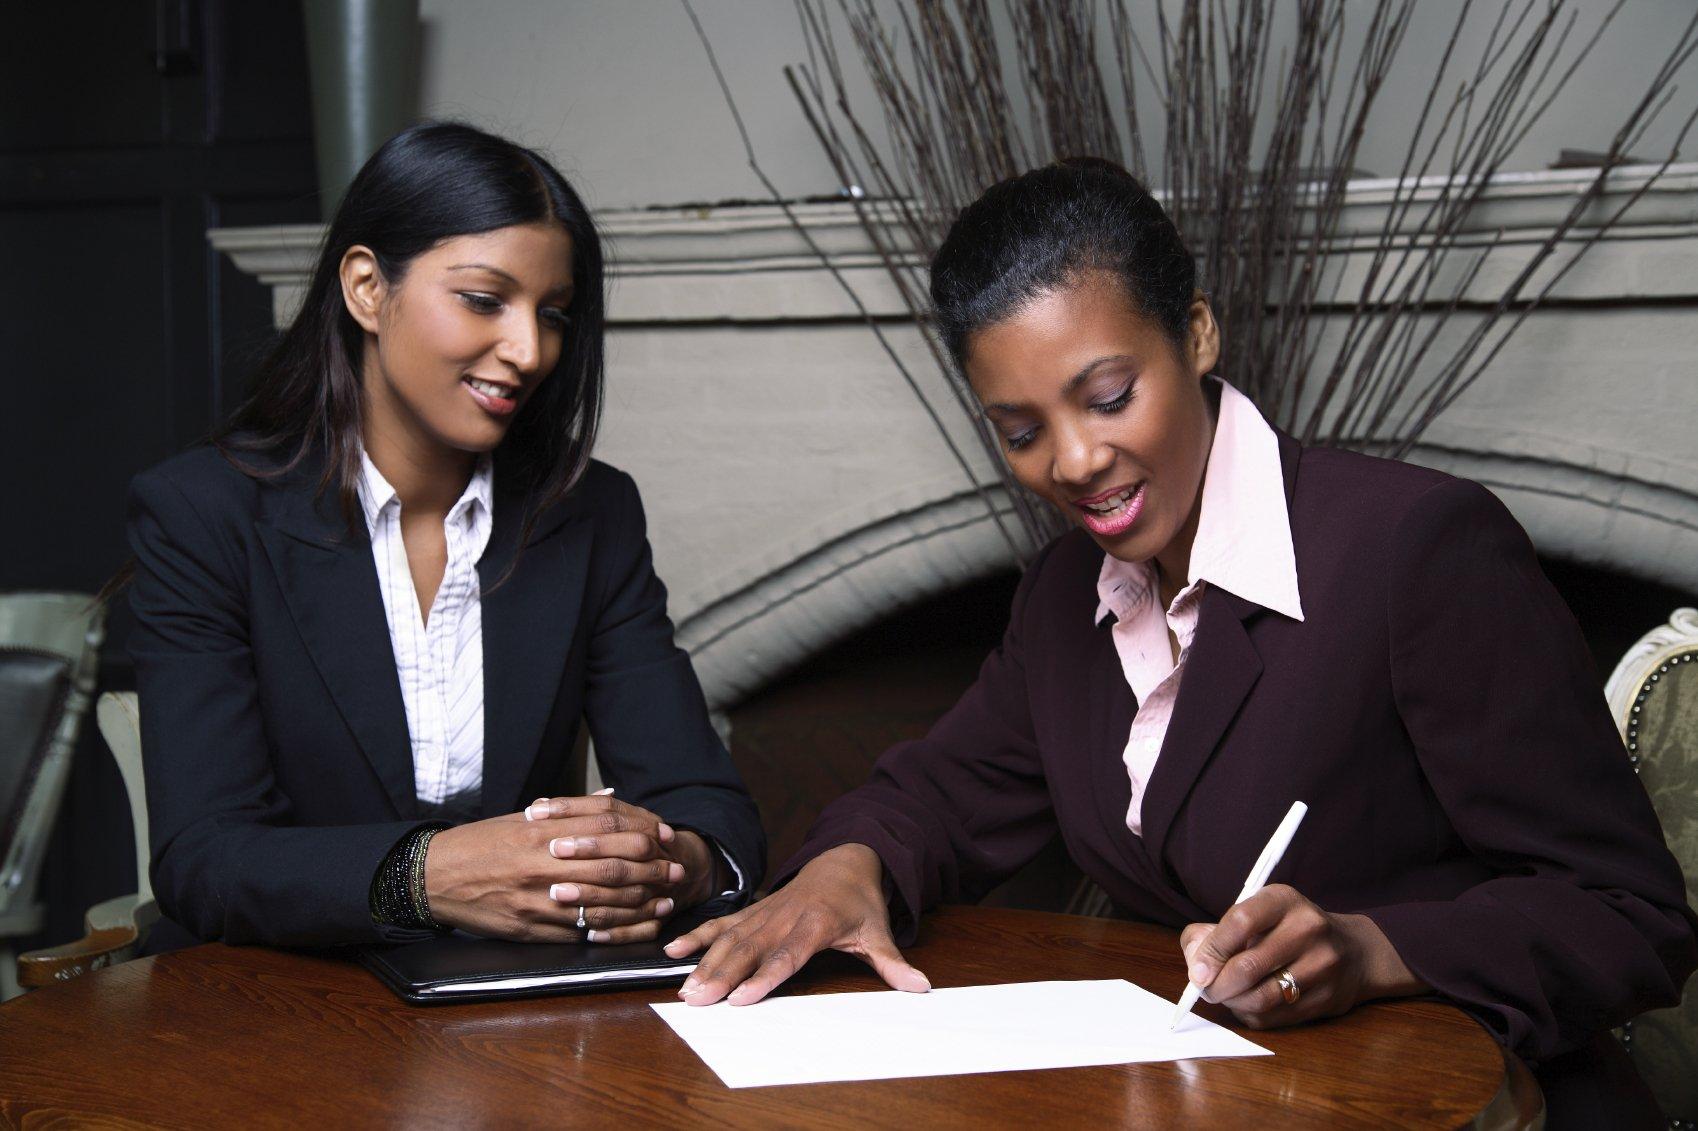 Bennu Financials and Restoration LLC